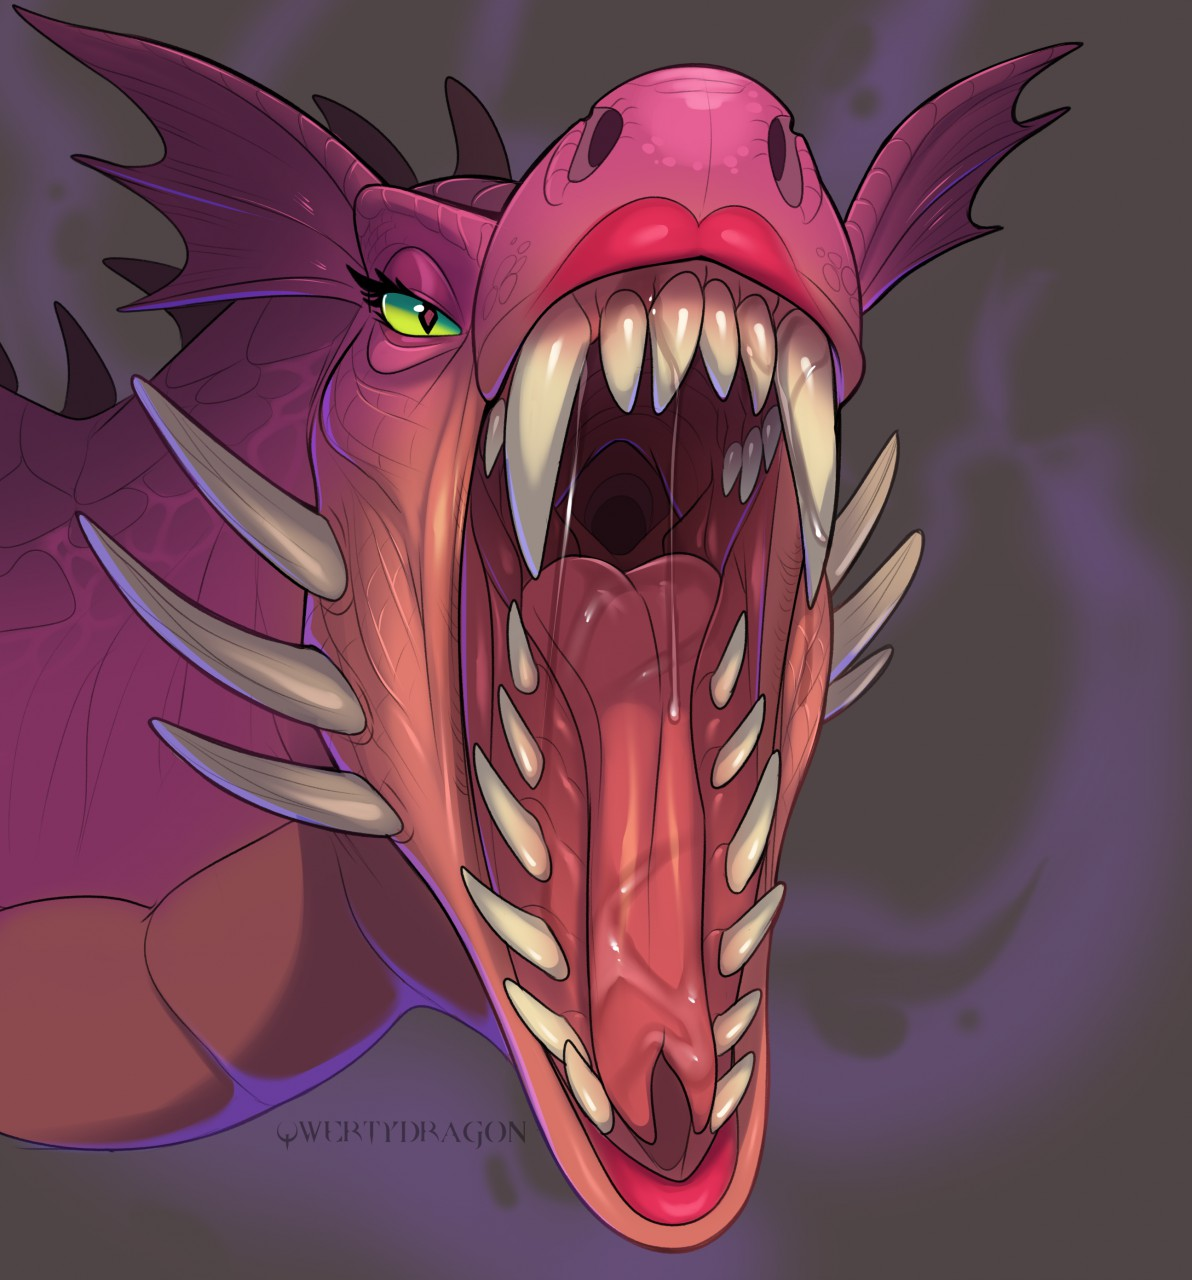 Characters: Dragons 1508467925_qwertydragon_shrek_dragon_by_reikothegwen-dc8unro